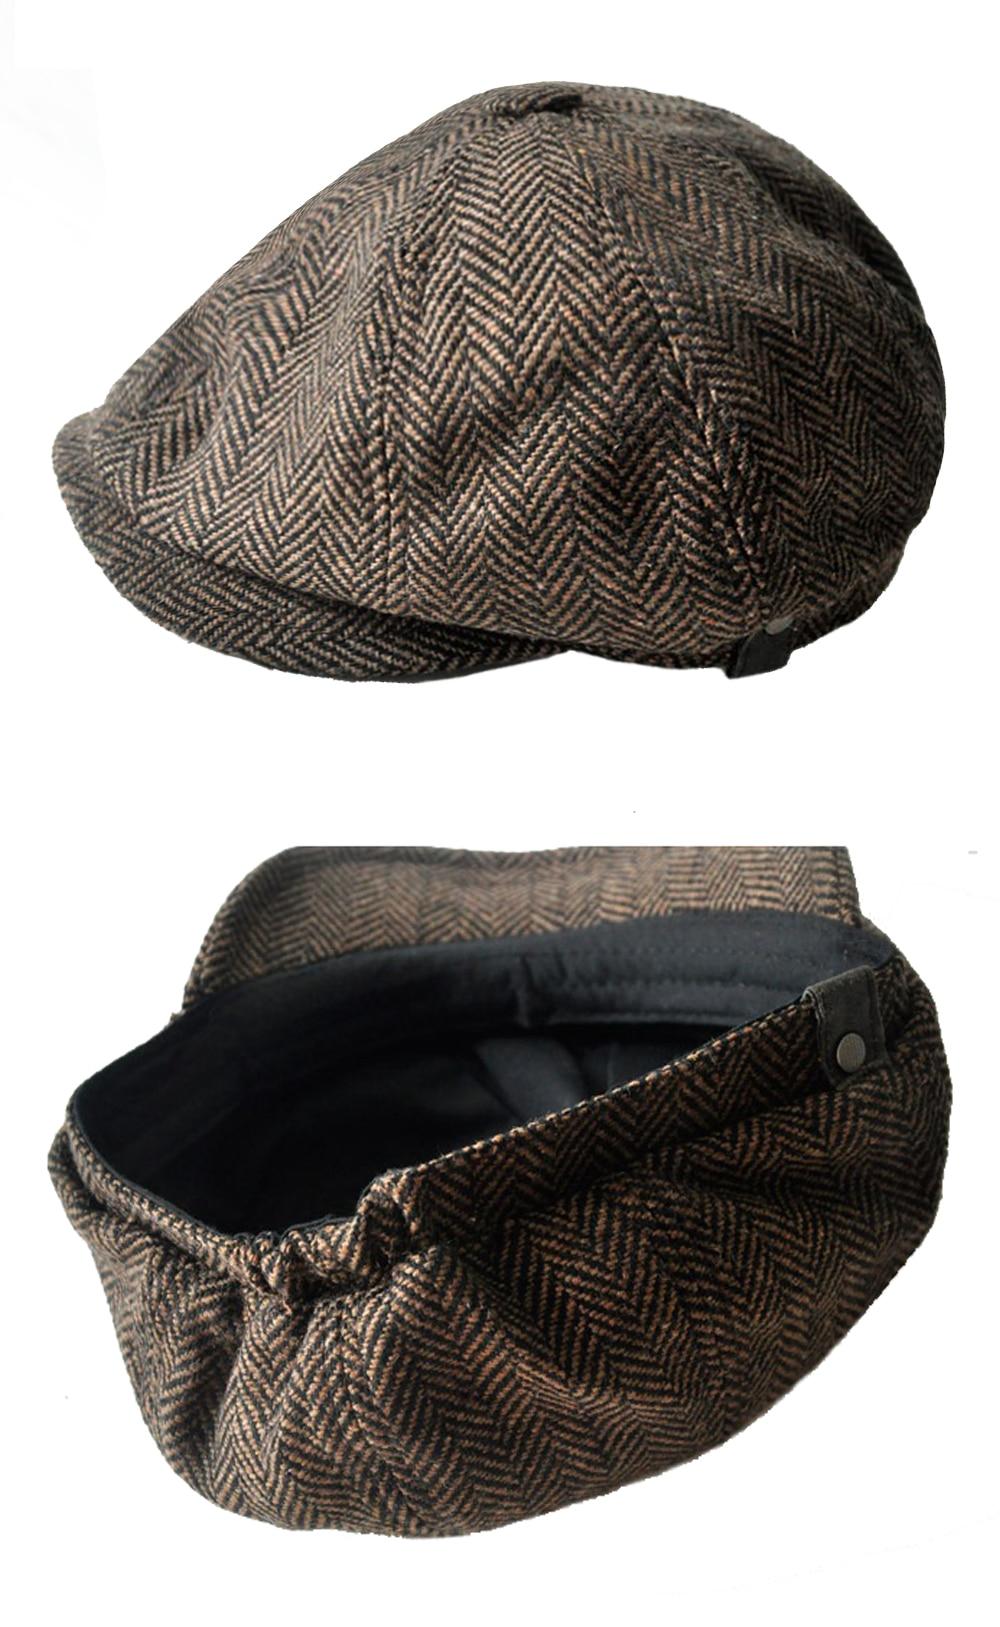 Newsboy Flat Cap - Wool Blend Newsboy Hat